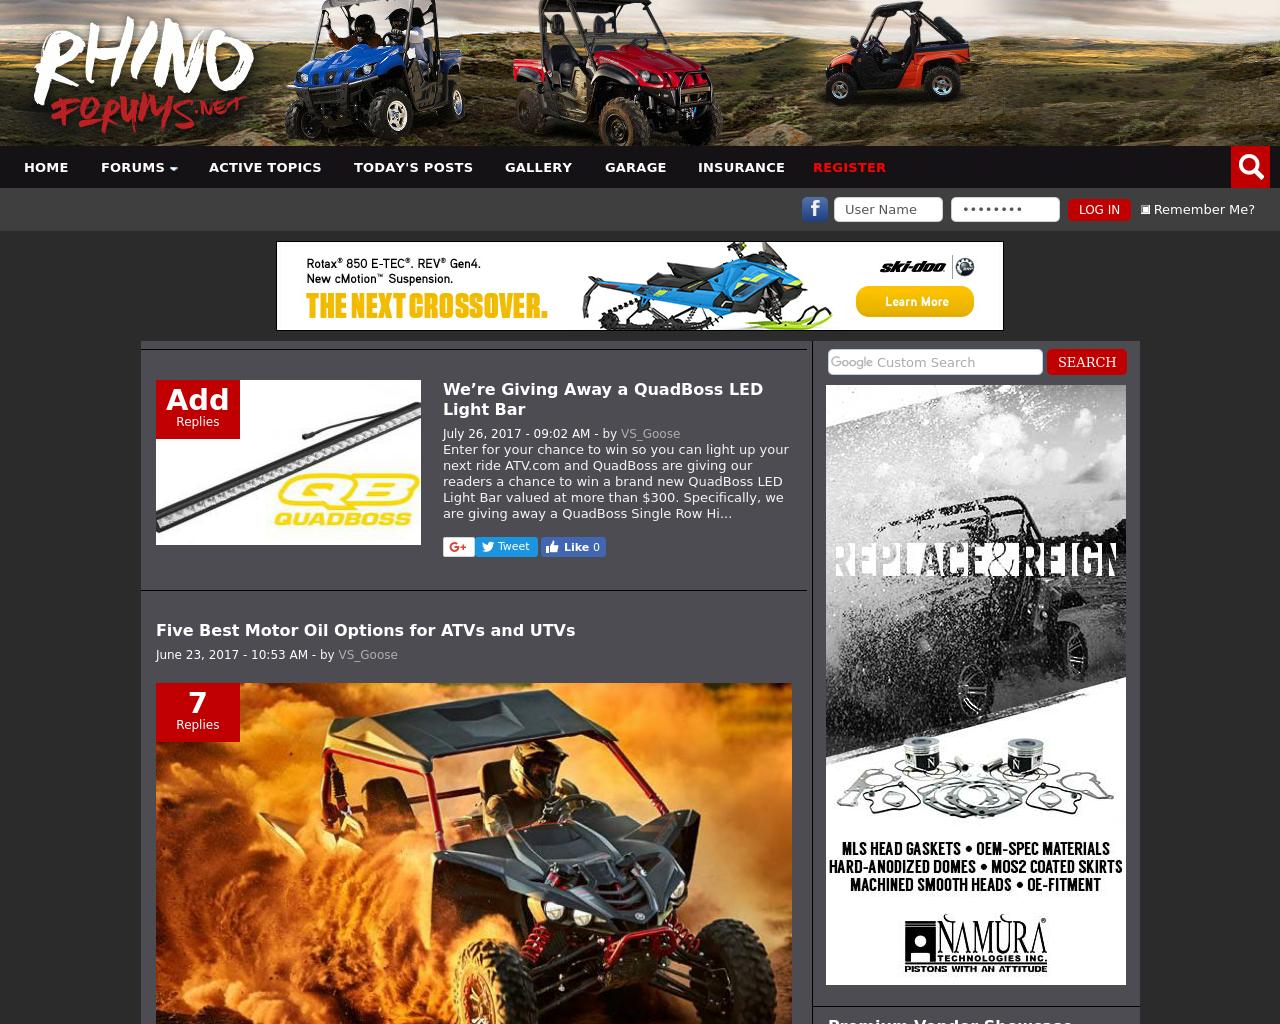 Rhino-Forums.net-Advertising-Reviews-Pricing